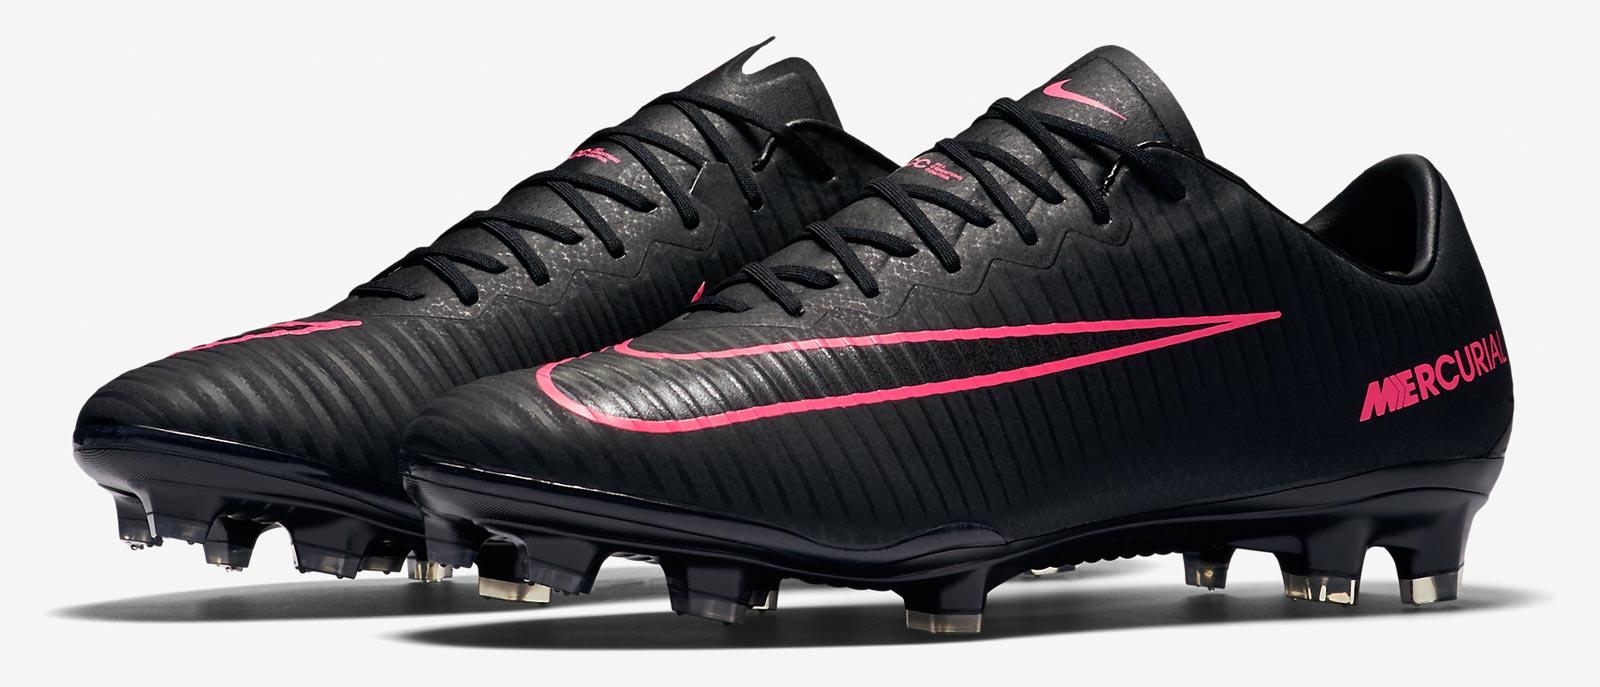 Nike Mercurial Vapor Xi Black